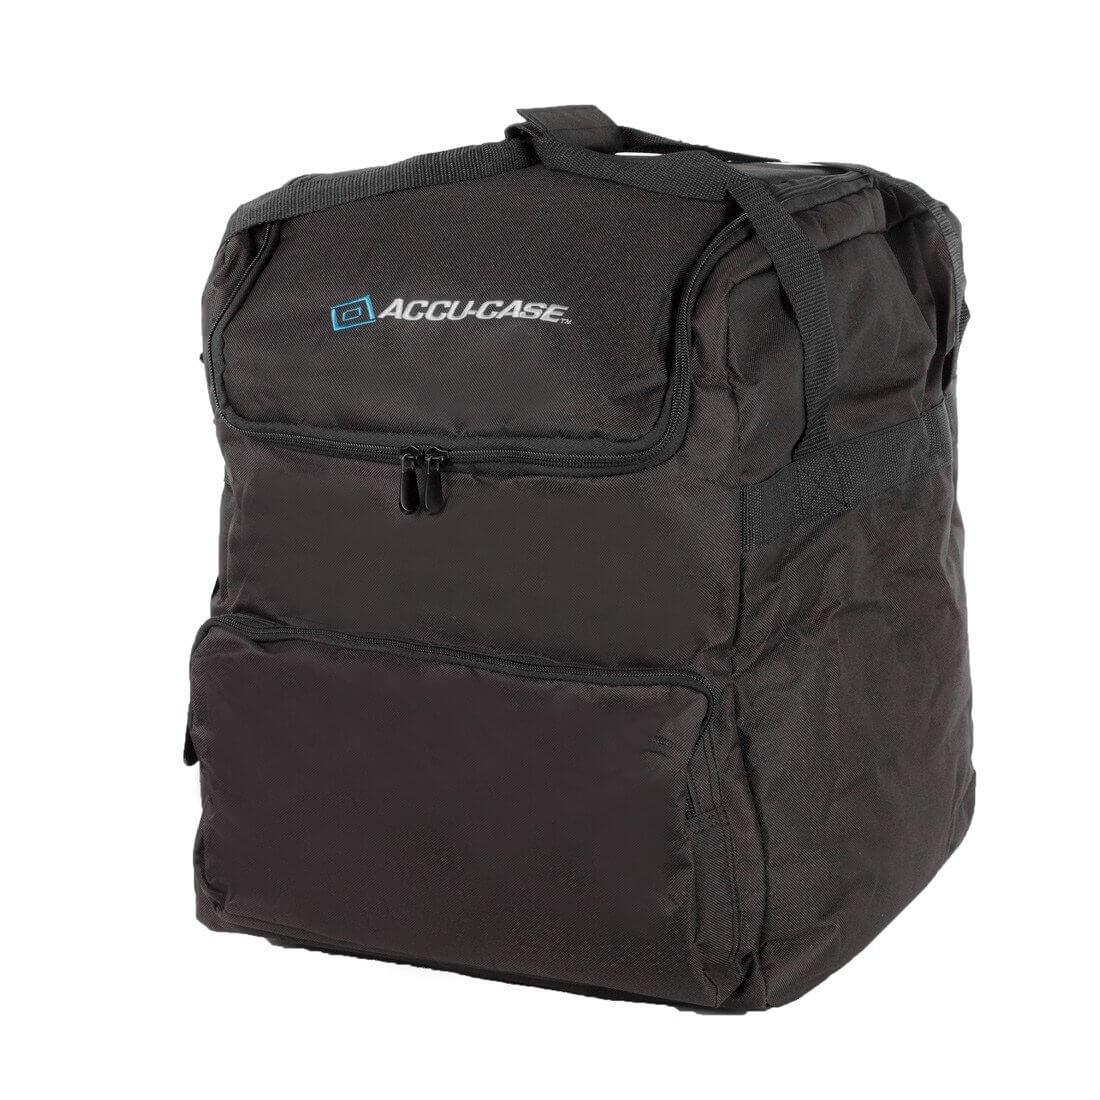 Accu-Case AC-160 Padded Transit Bag Case Flightcase - Fits ADJ Starburst